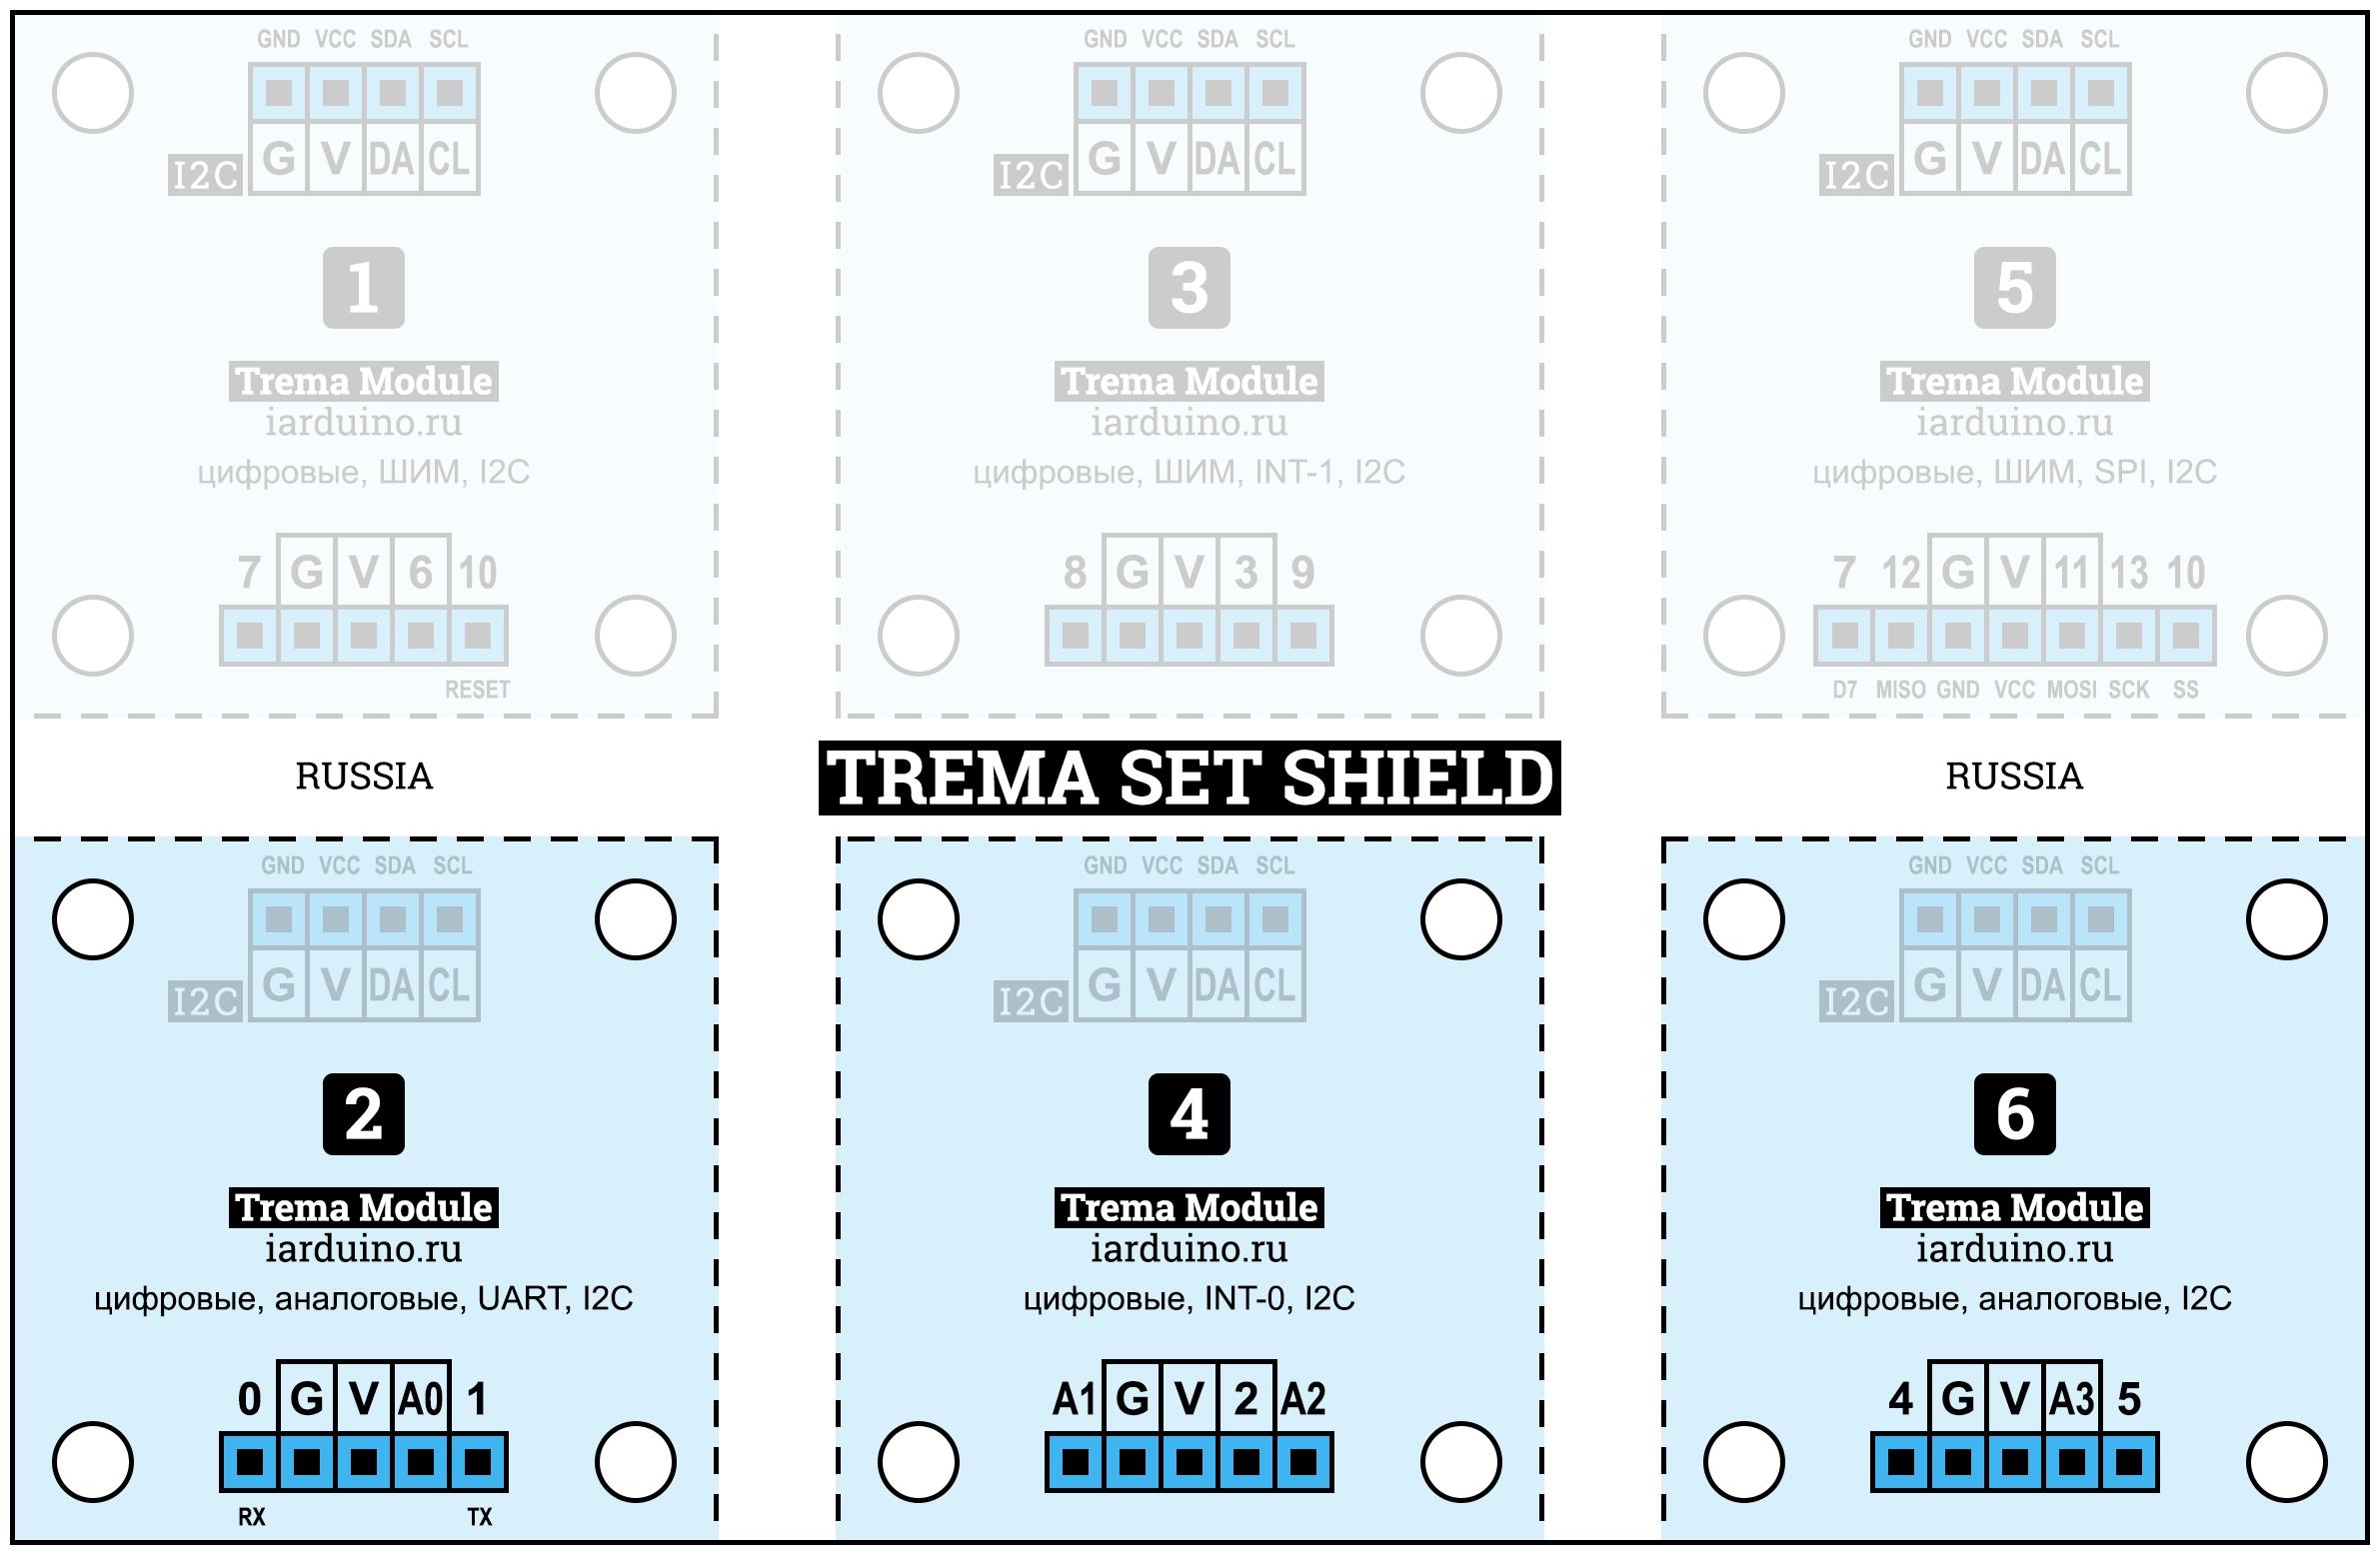 Схема подключения LED индикатора к Trema Set Shield